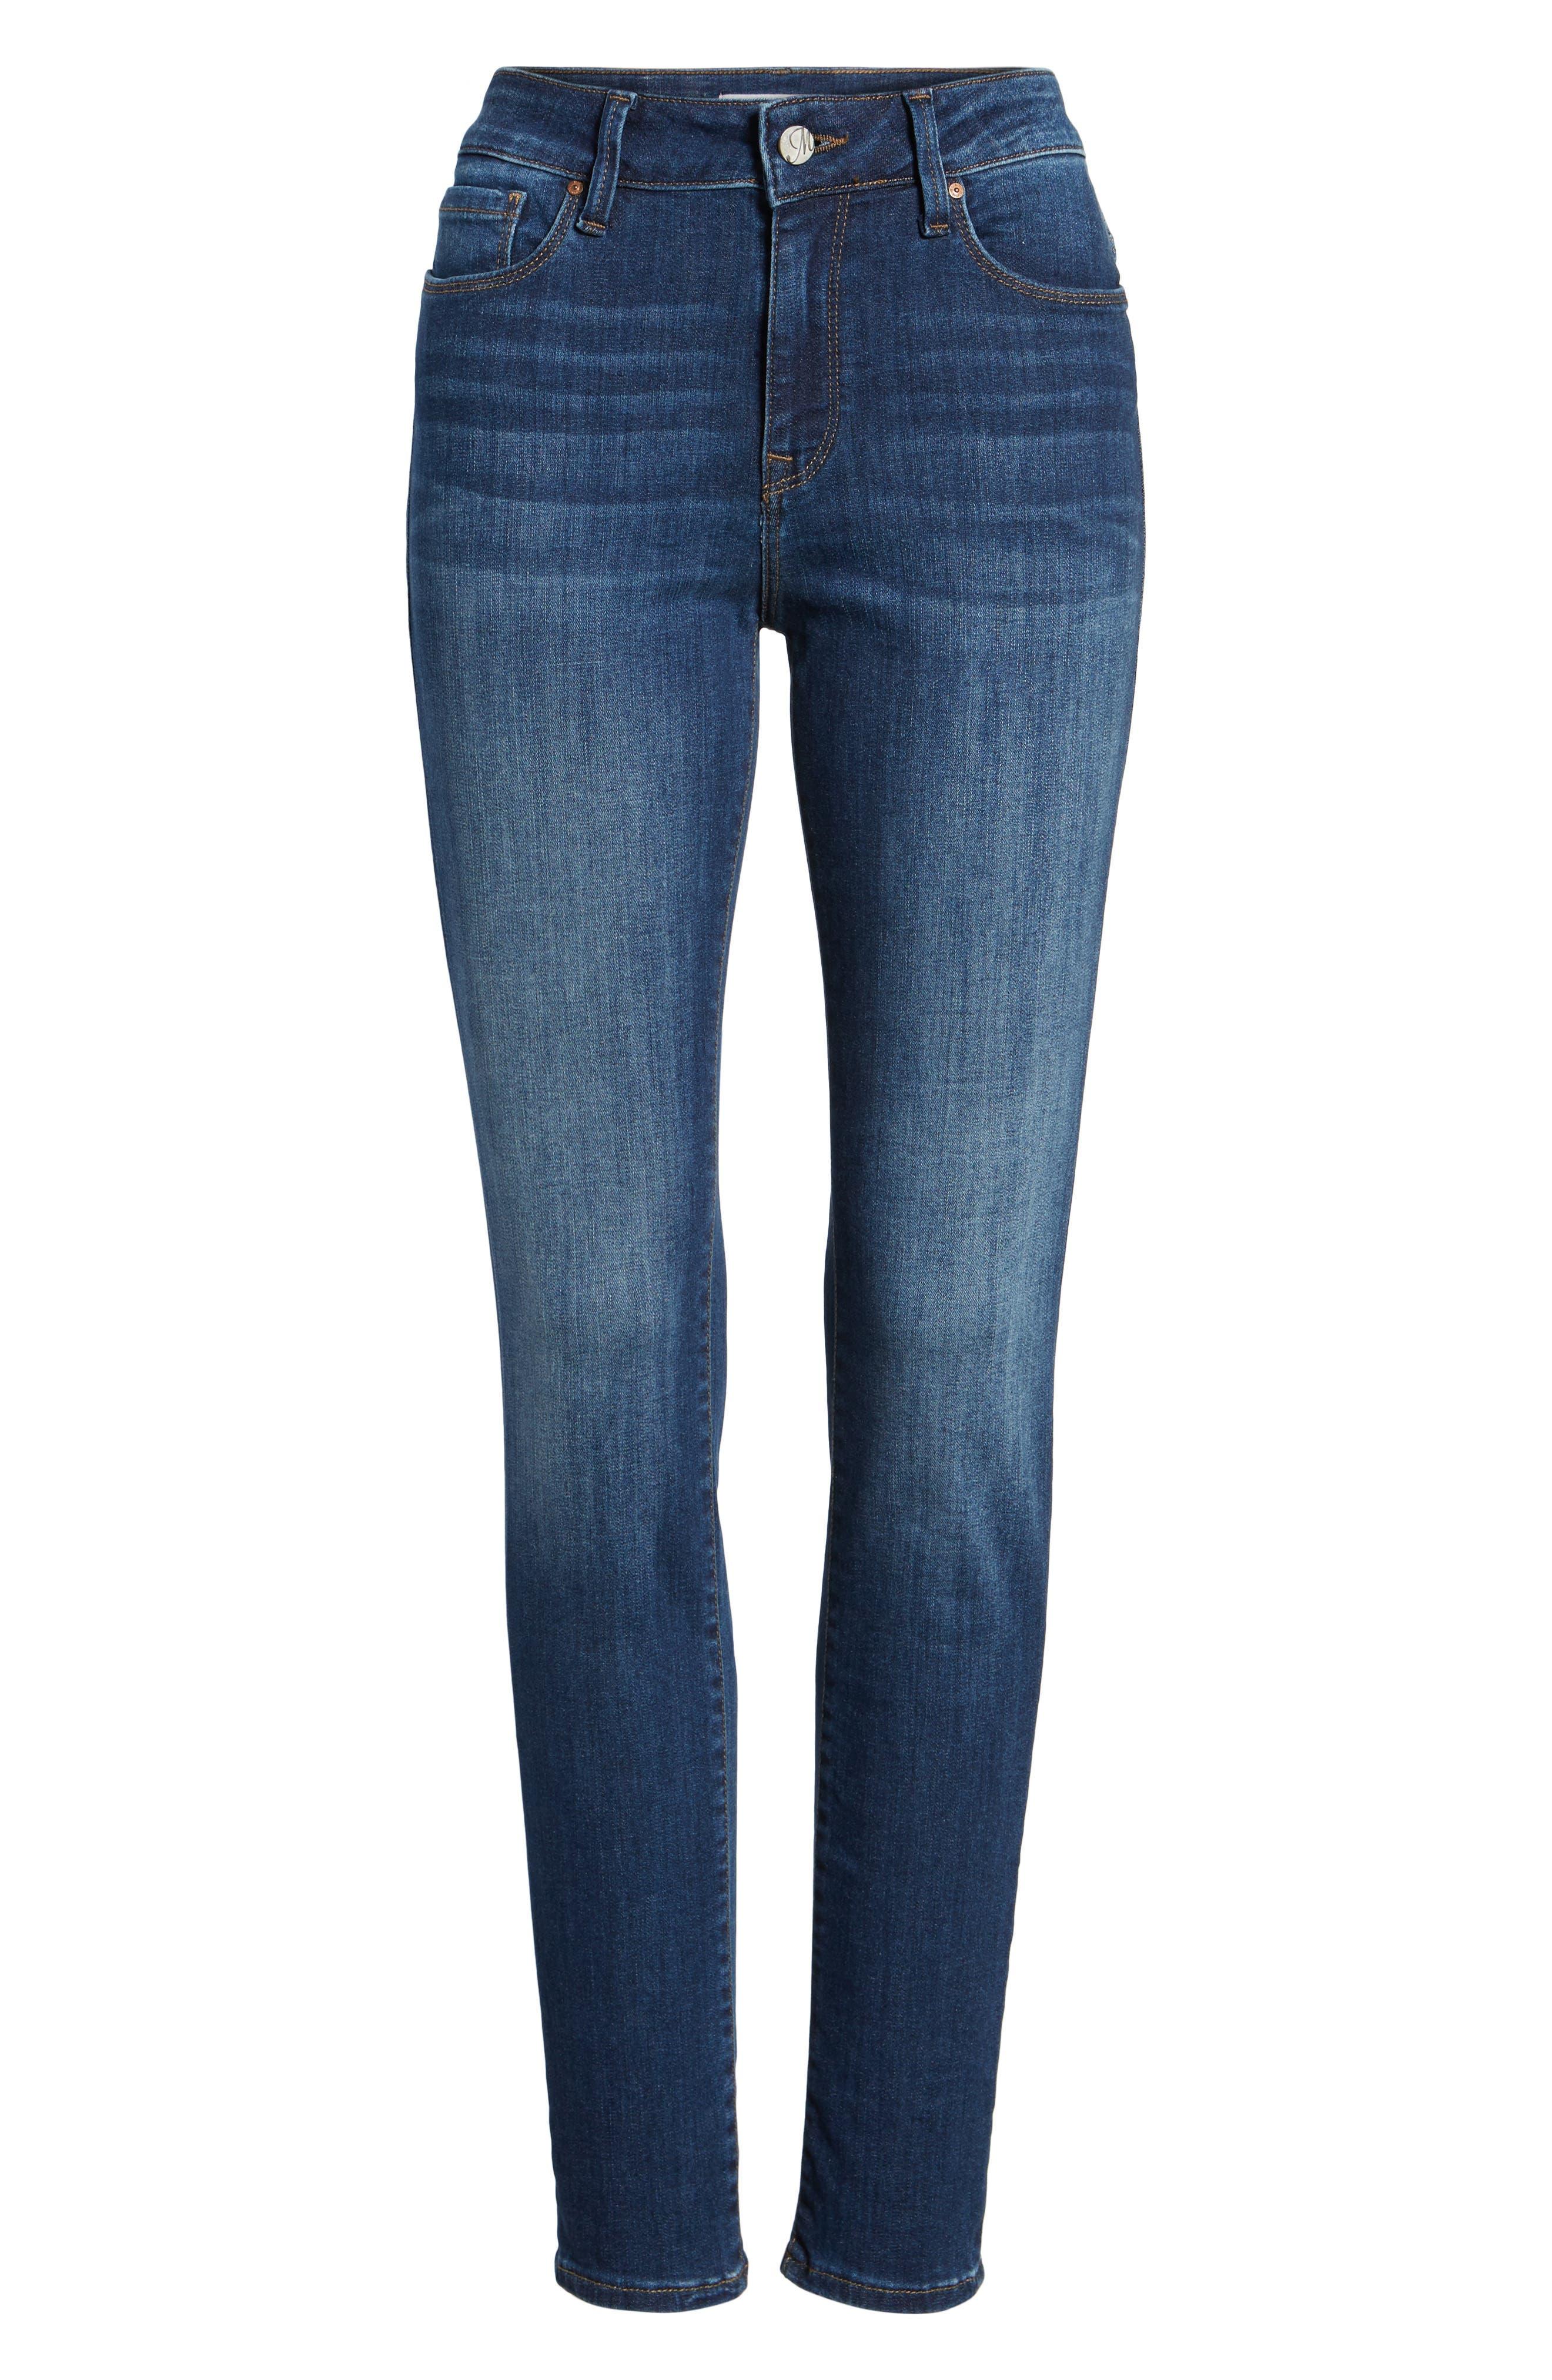 Alissa Super Skinny Jeans,                             Alternate thumbnail 6, color,                             Dark Indigo Tribeca